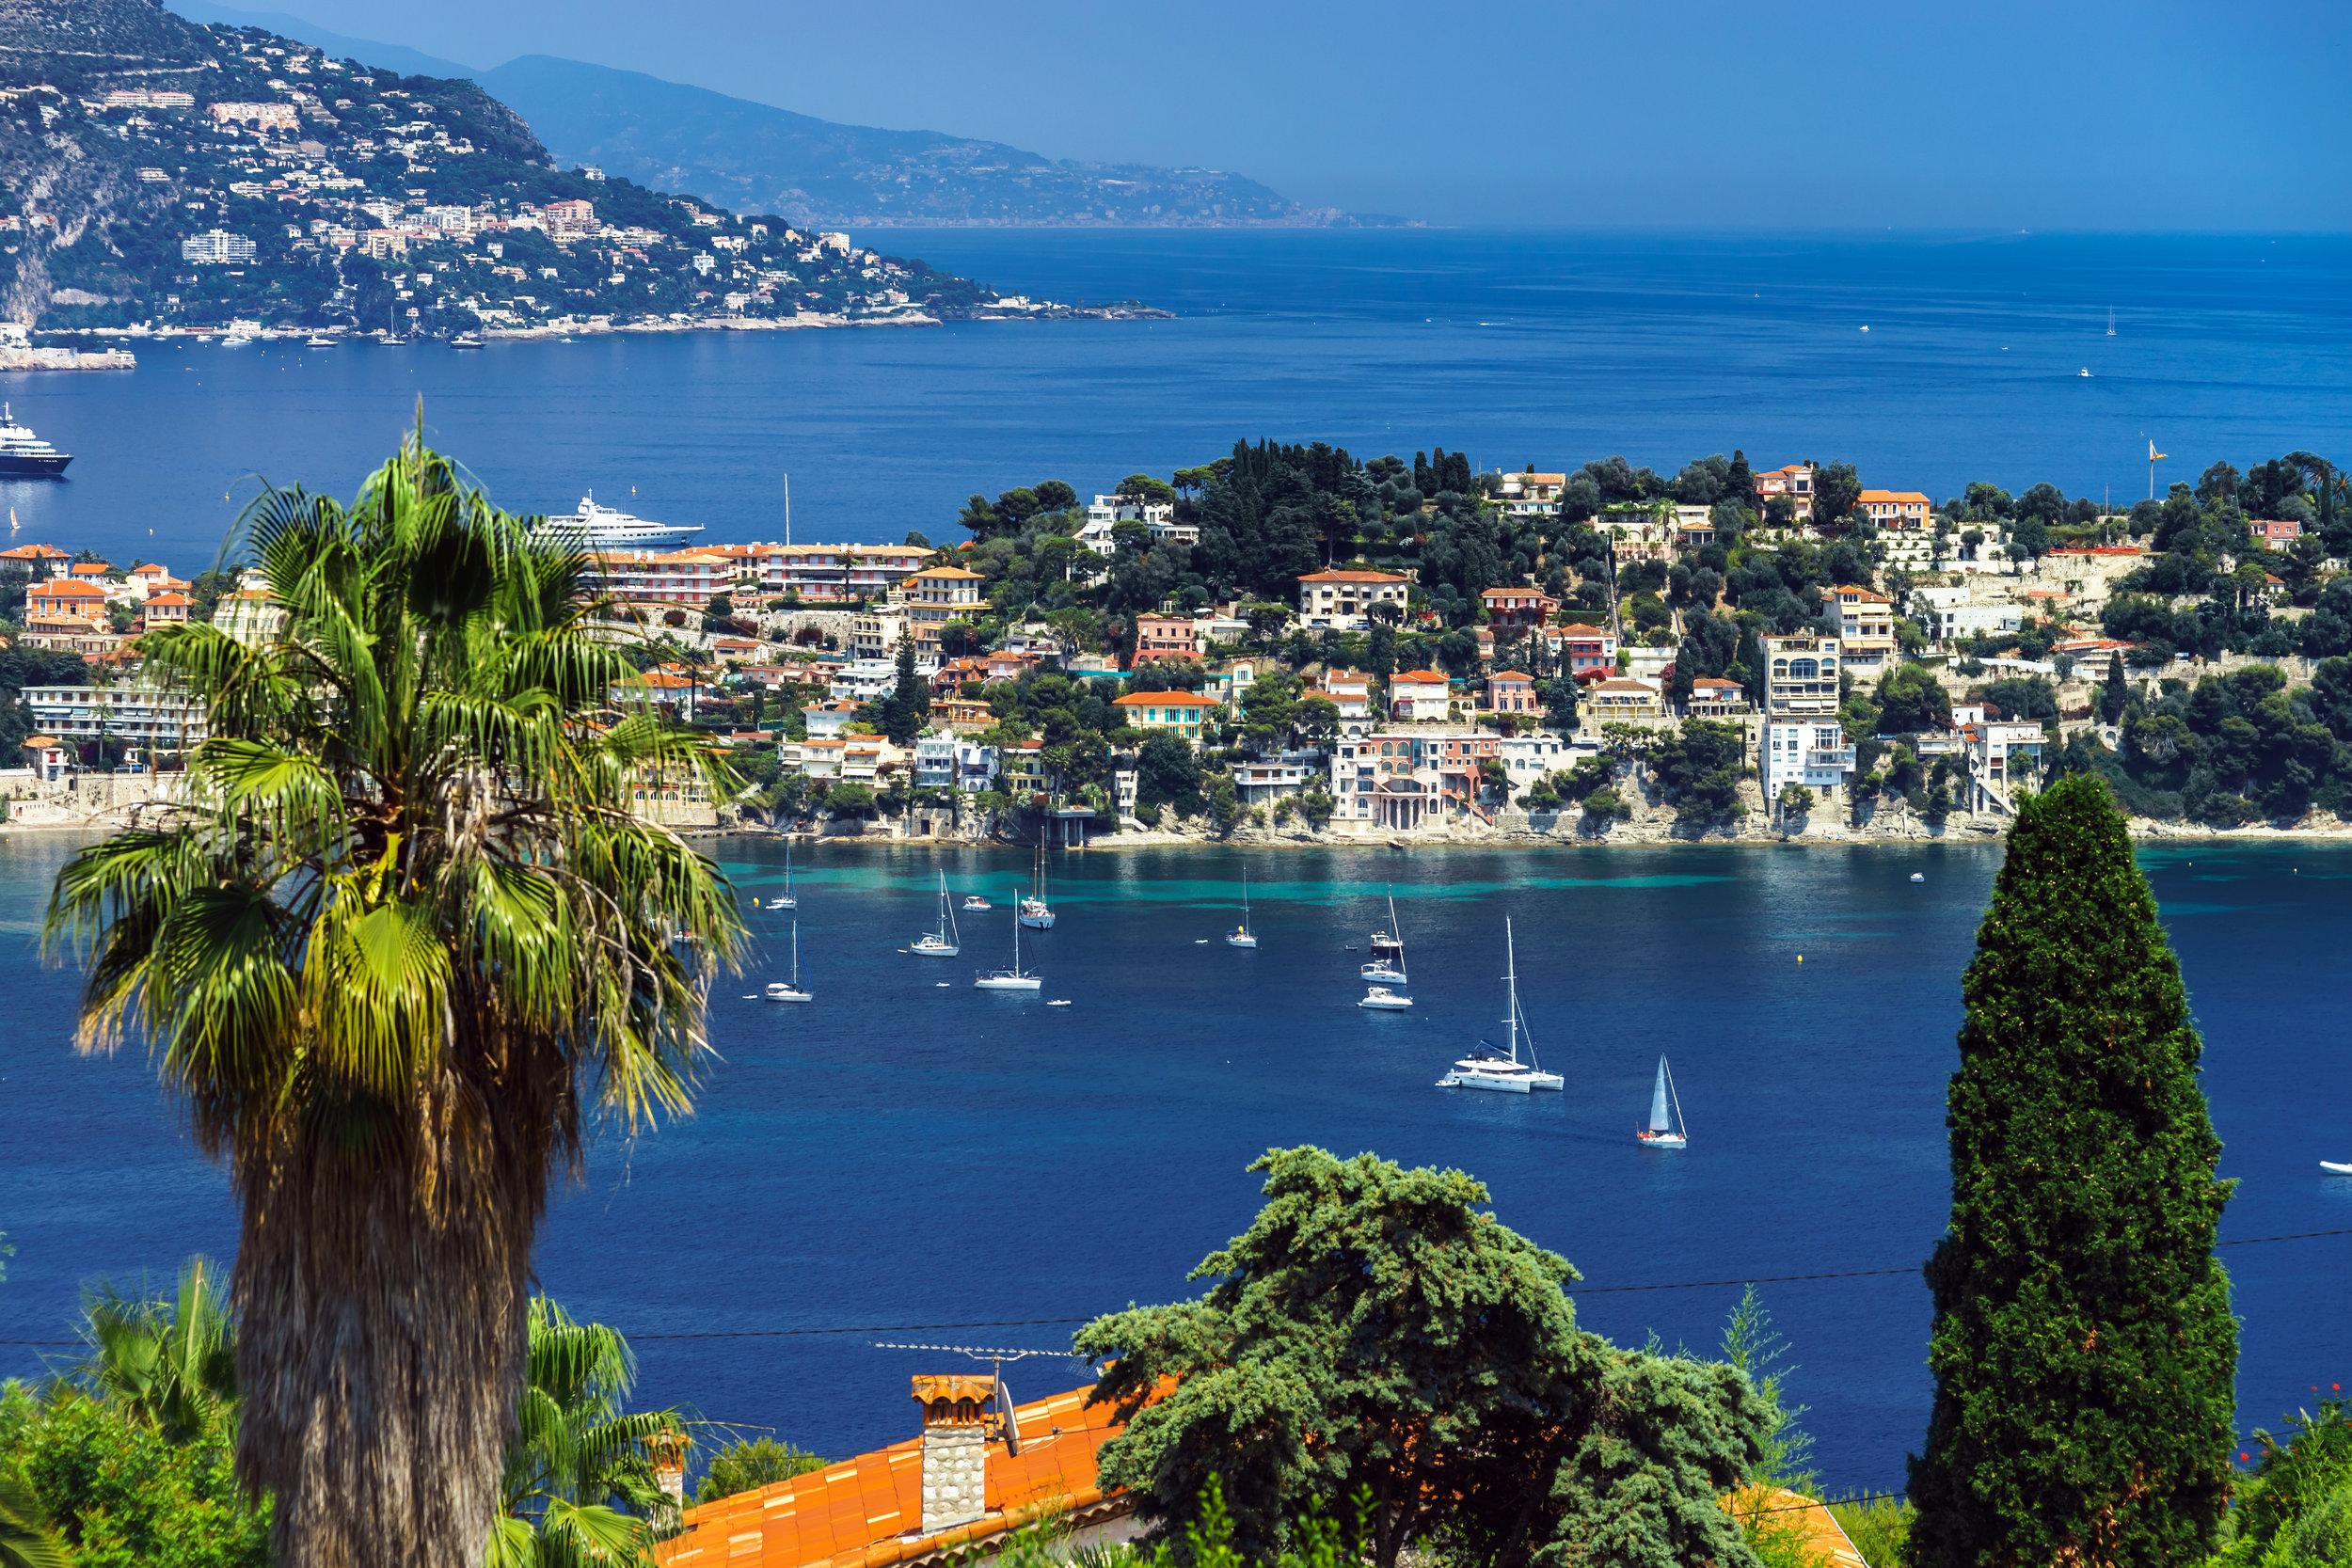 france_nice_bigstock-Summer-Day-In-Nice-France-Co-95721344.jpg